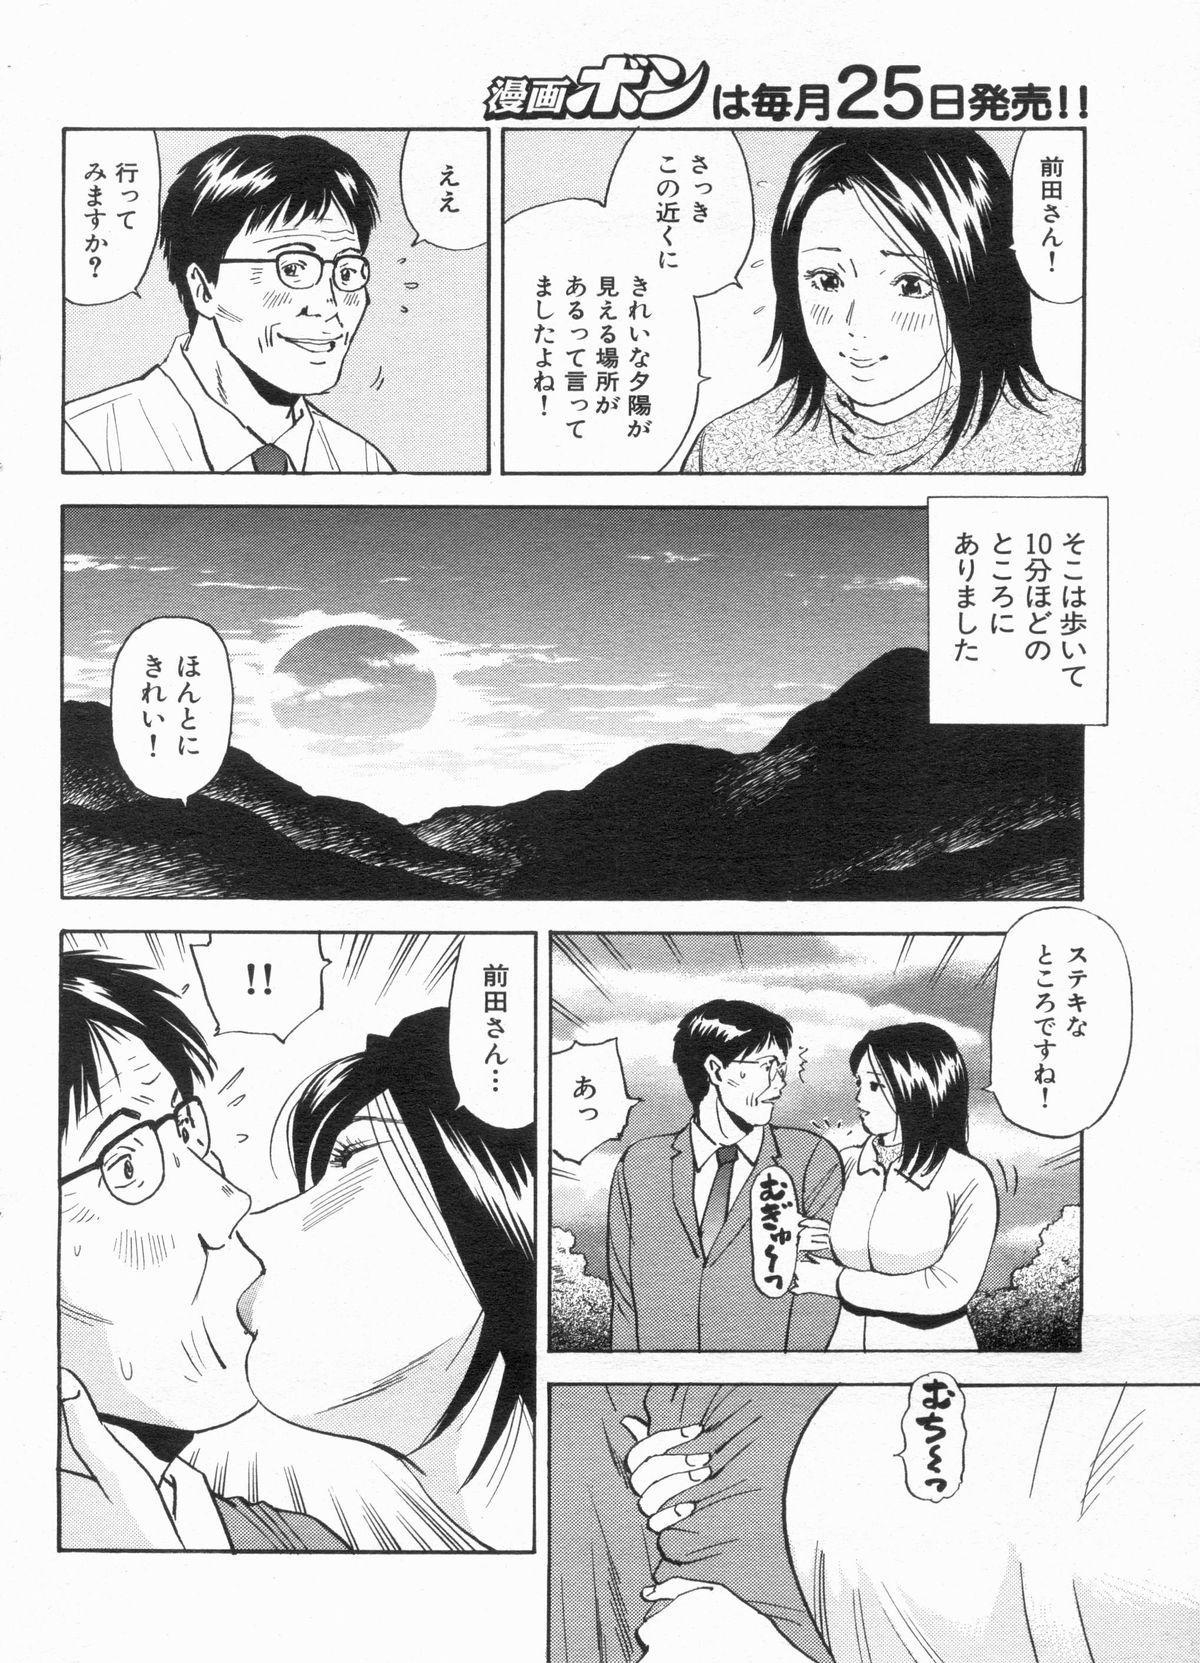 Manga Bon 2013-03 76